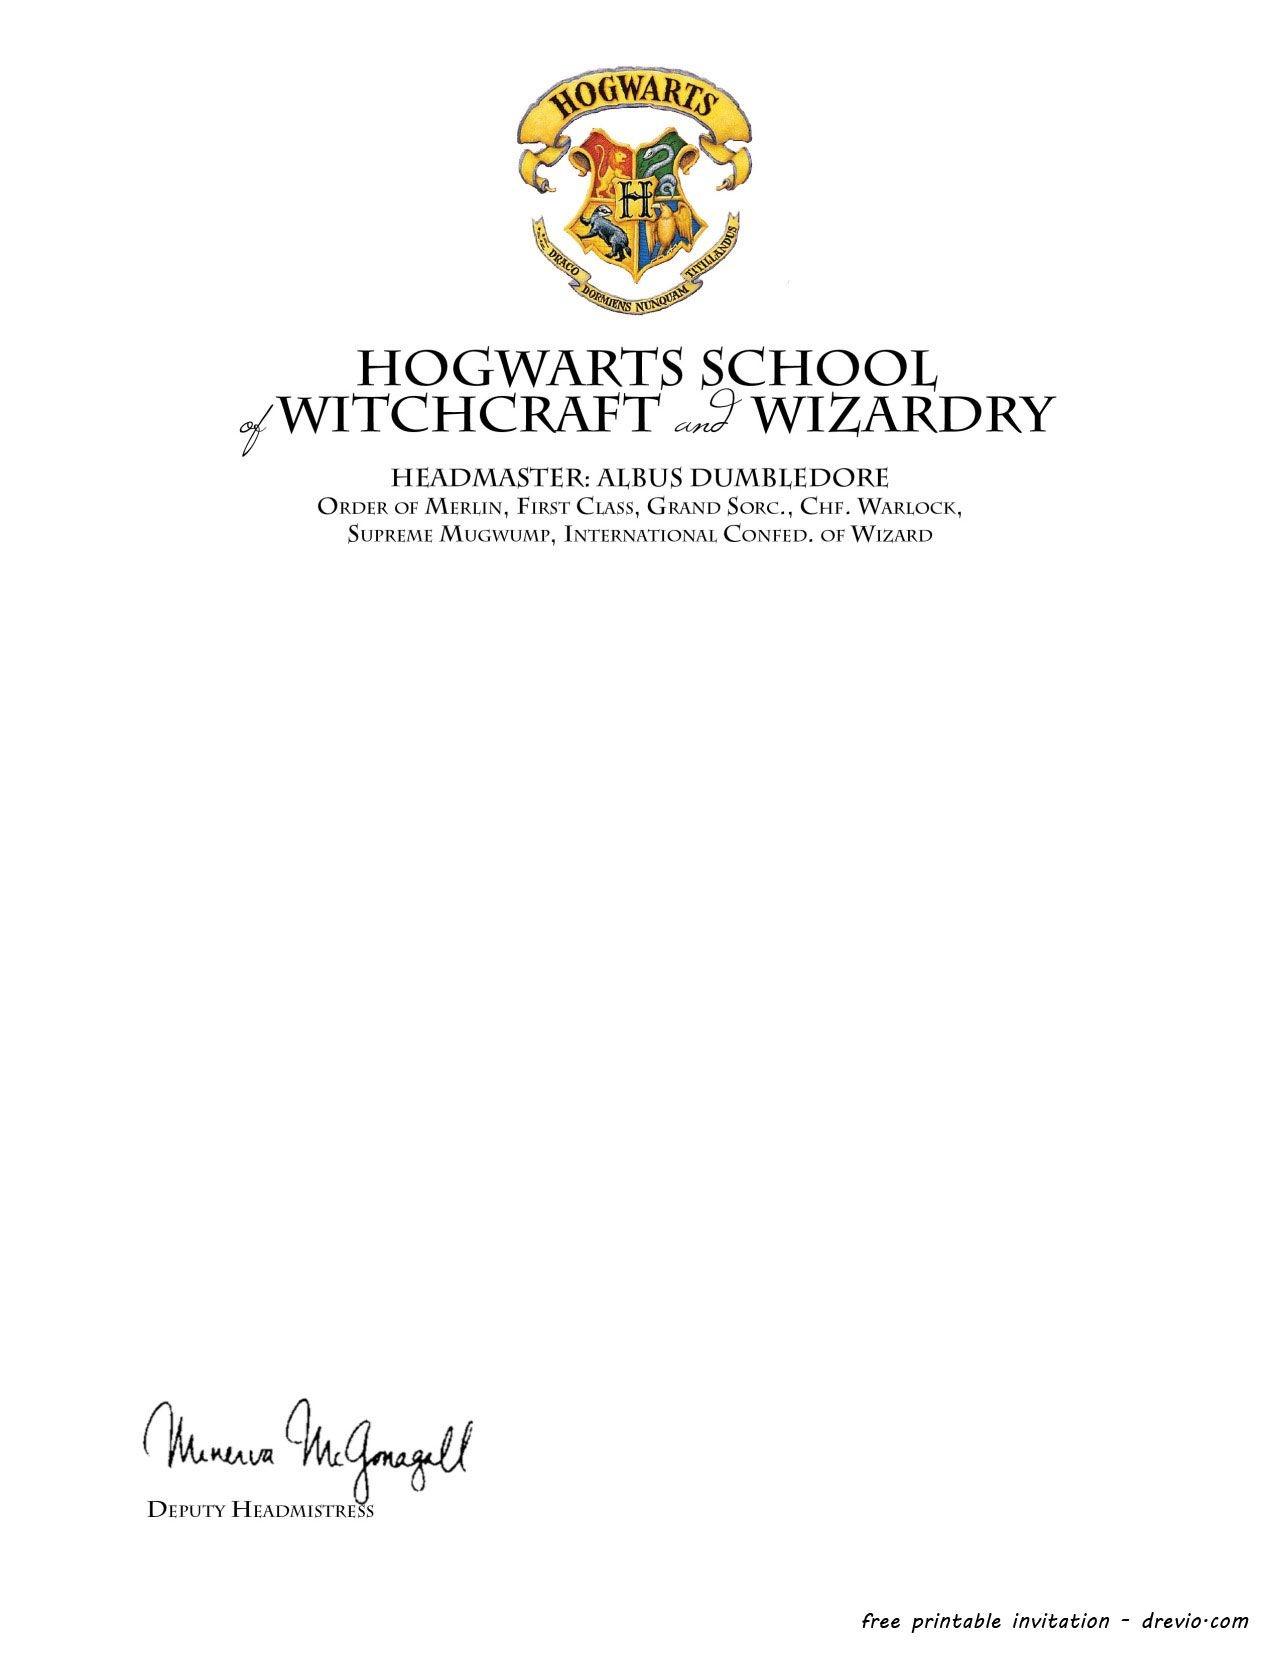 Harry Potter Birthday Invitations Printable -   Hosting A Harry - Harry Potter Birthday Invitations Free Printable